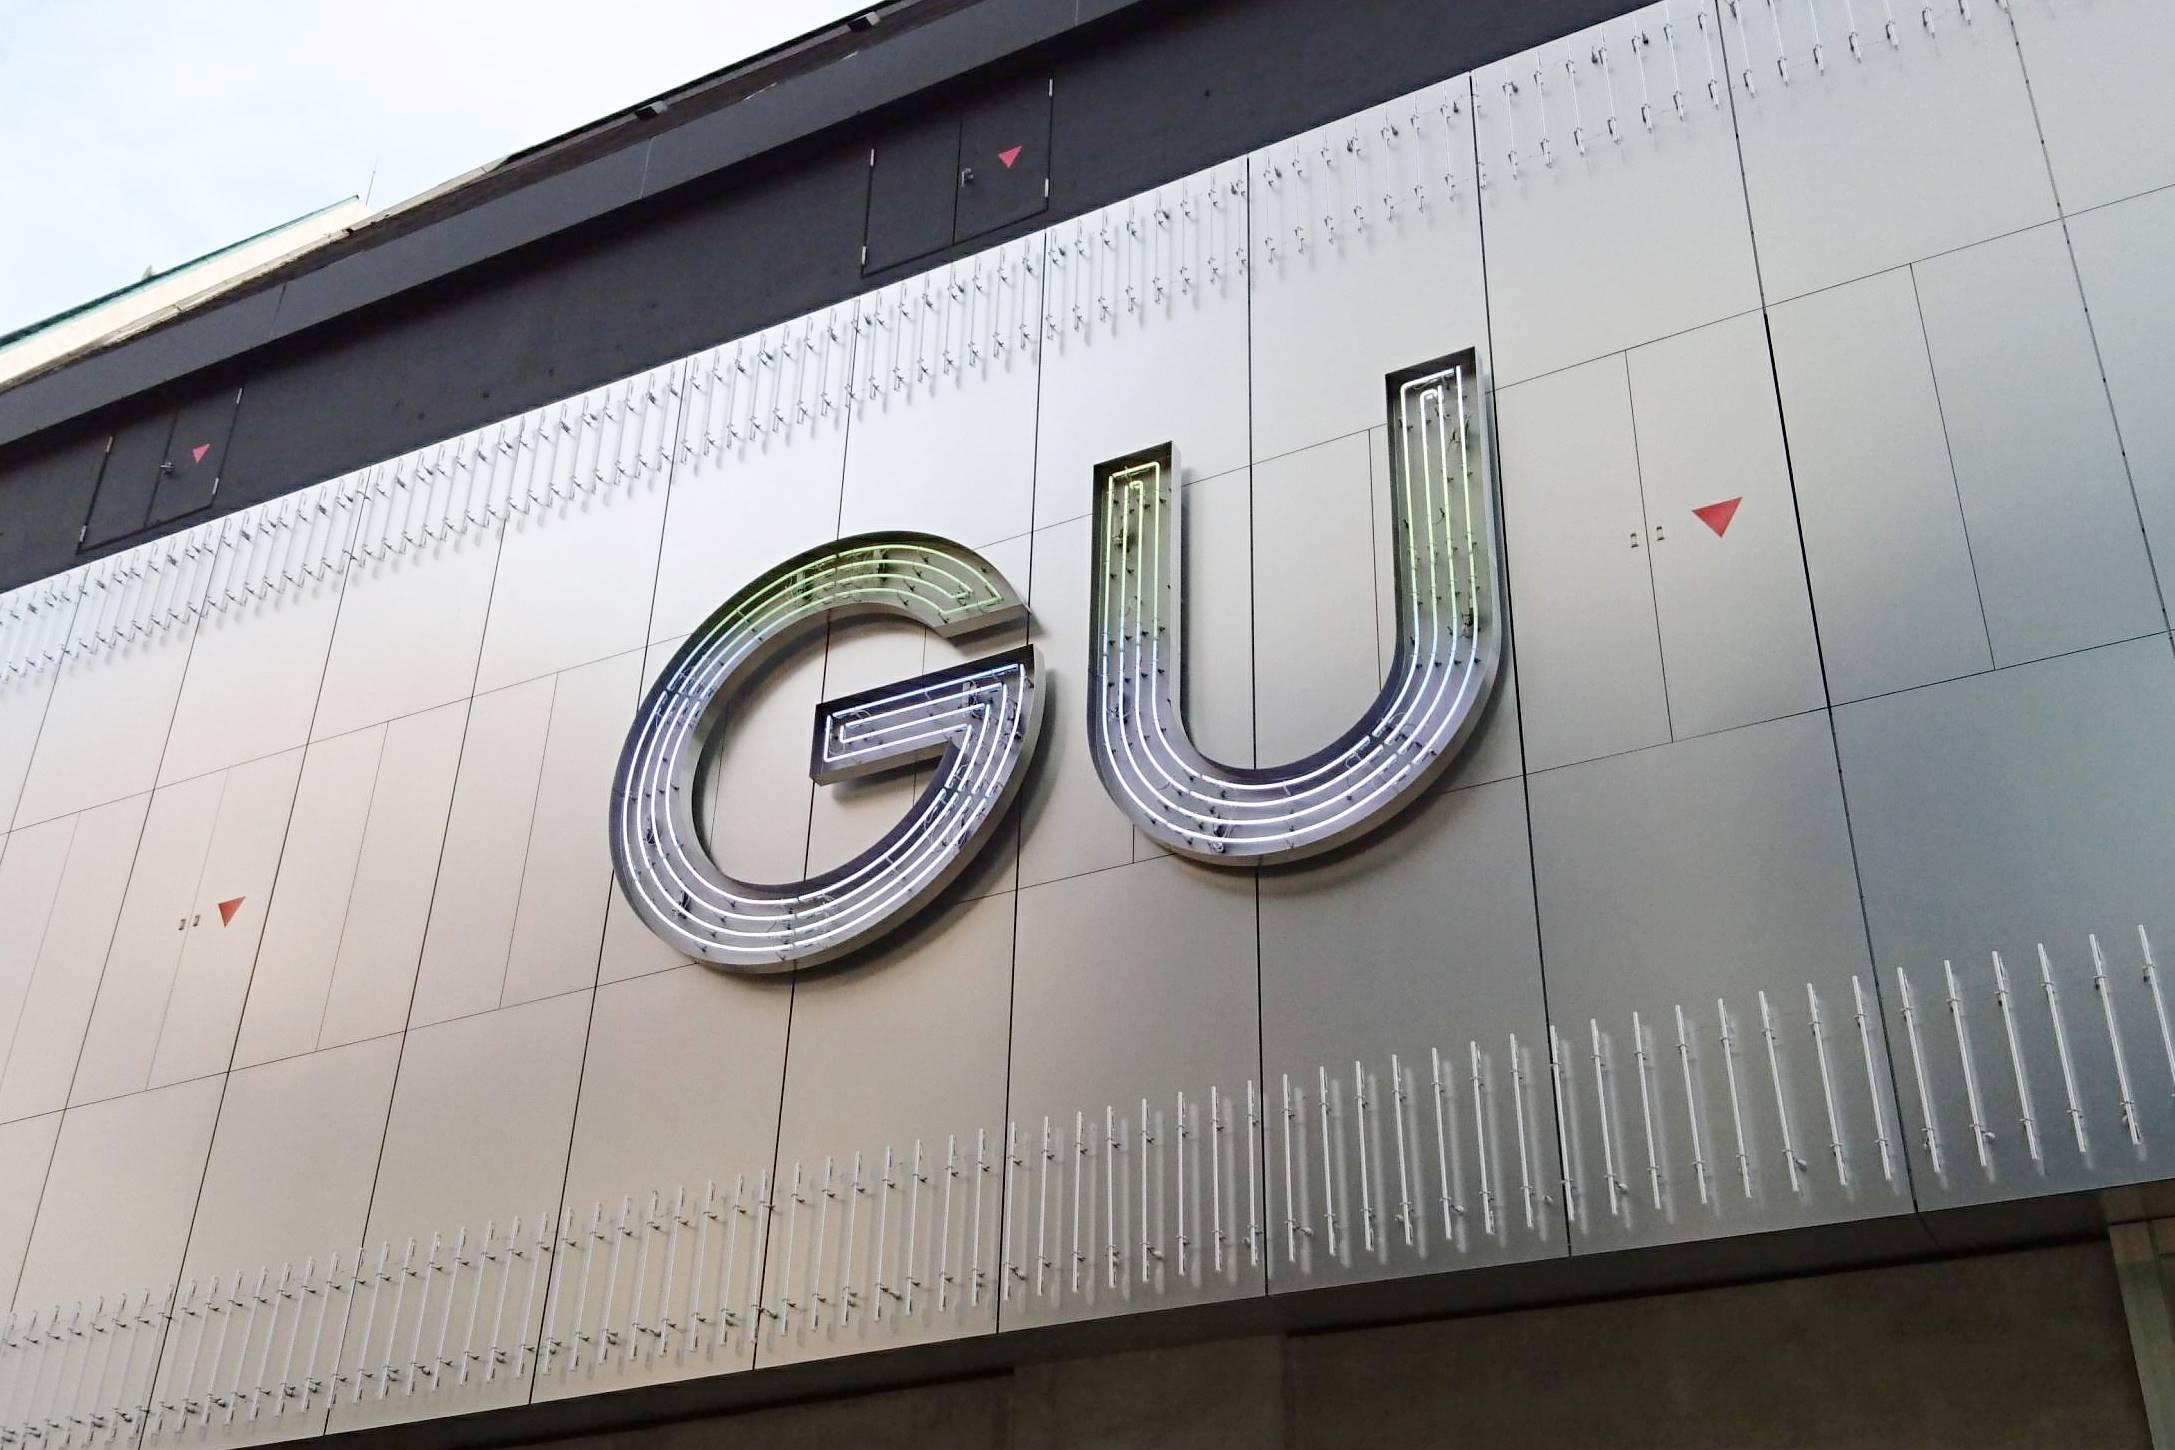 【GU新作】ライトフリースコートが優秀!シルエットが最強に可愛い♡